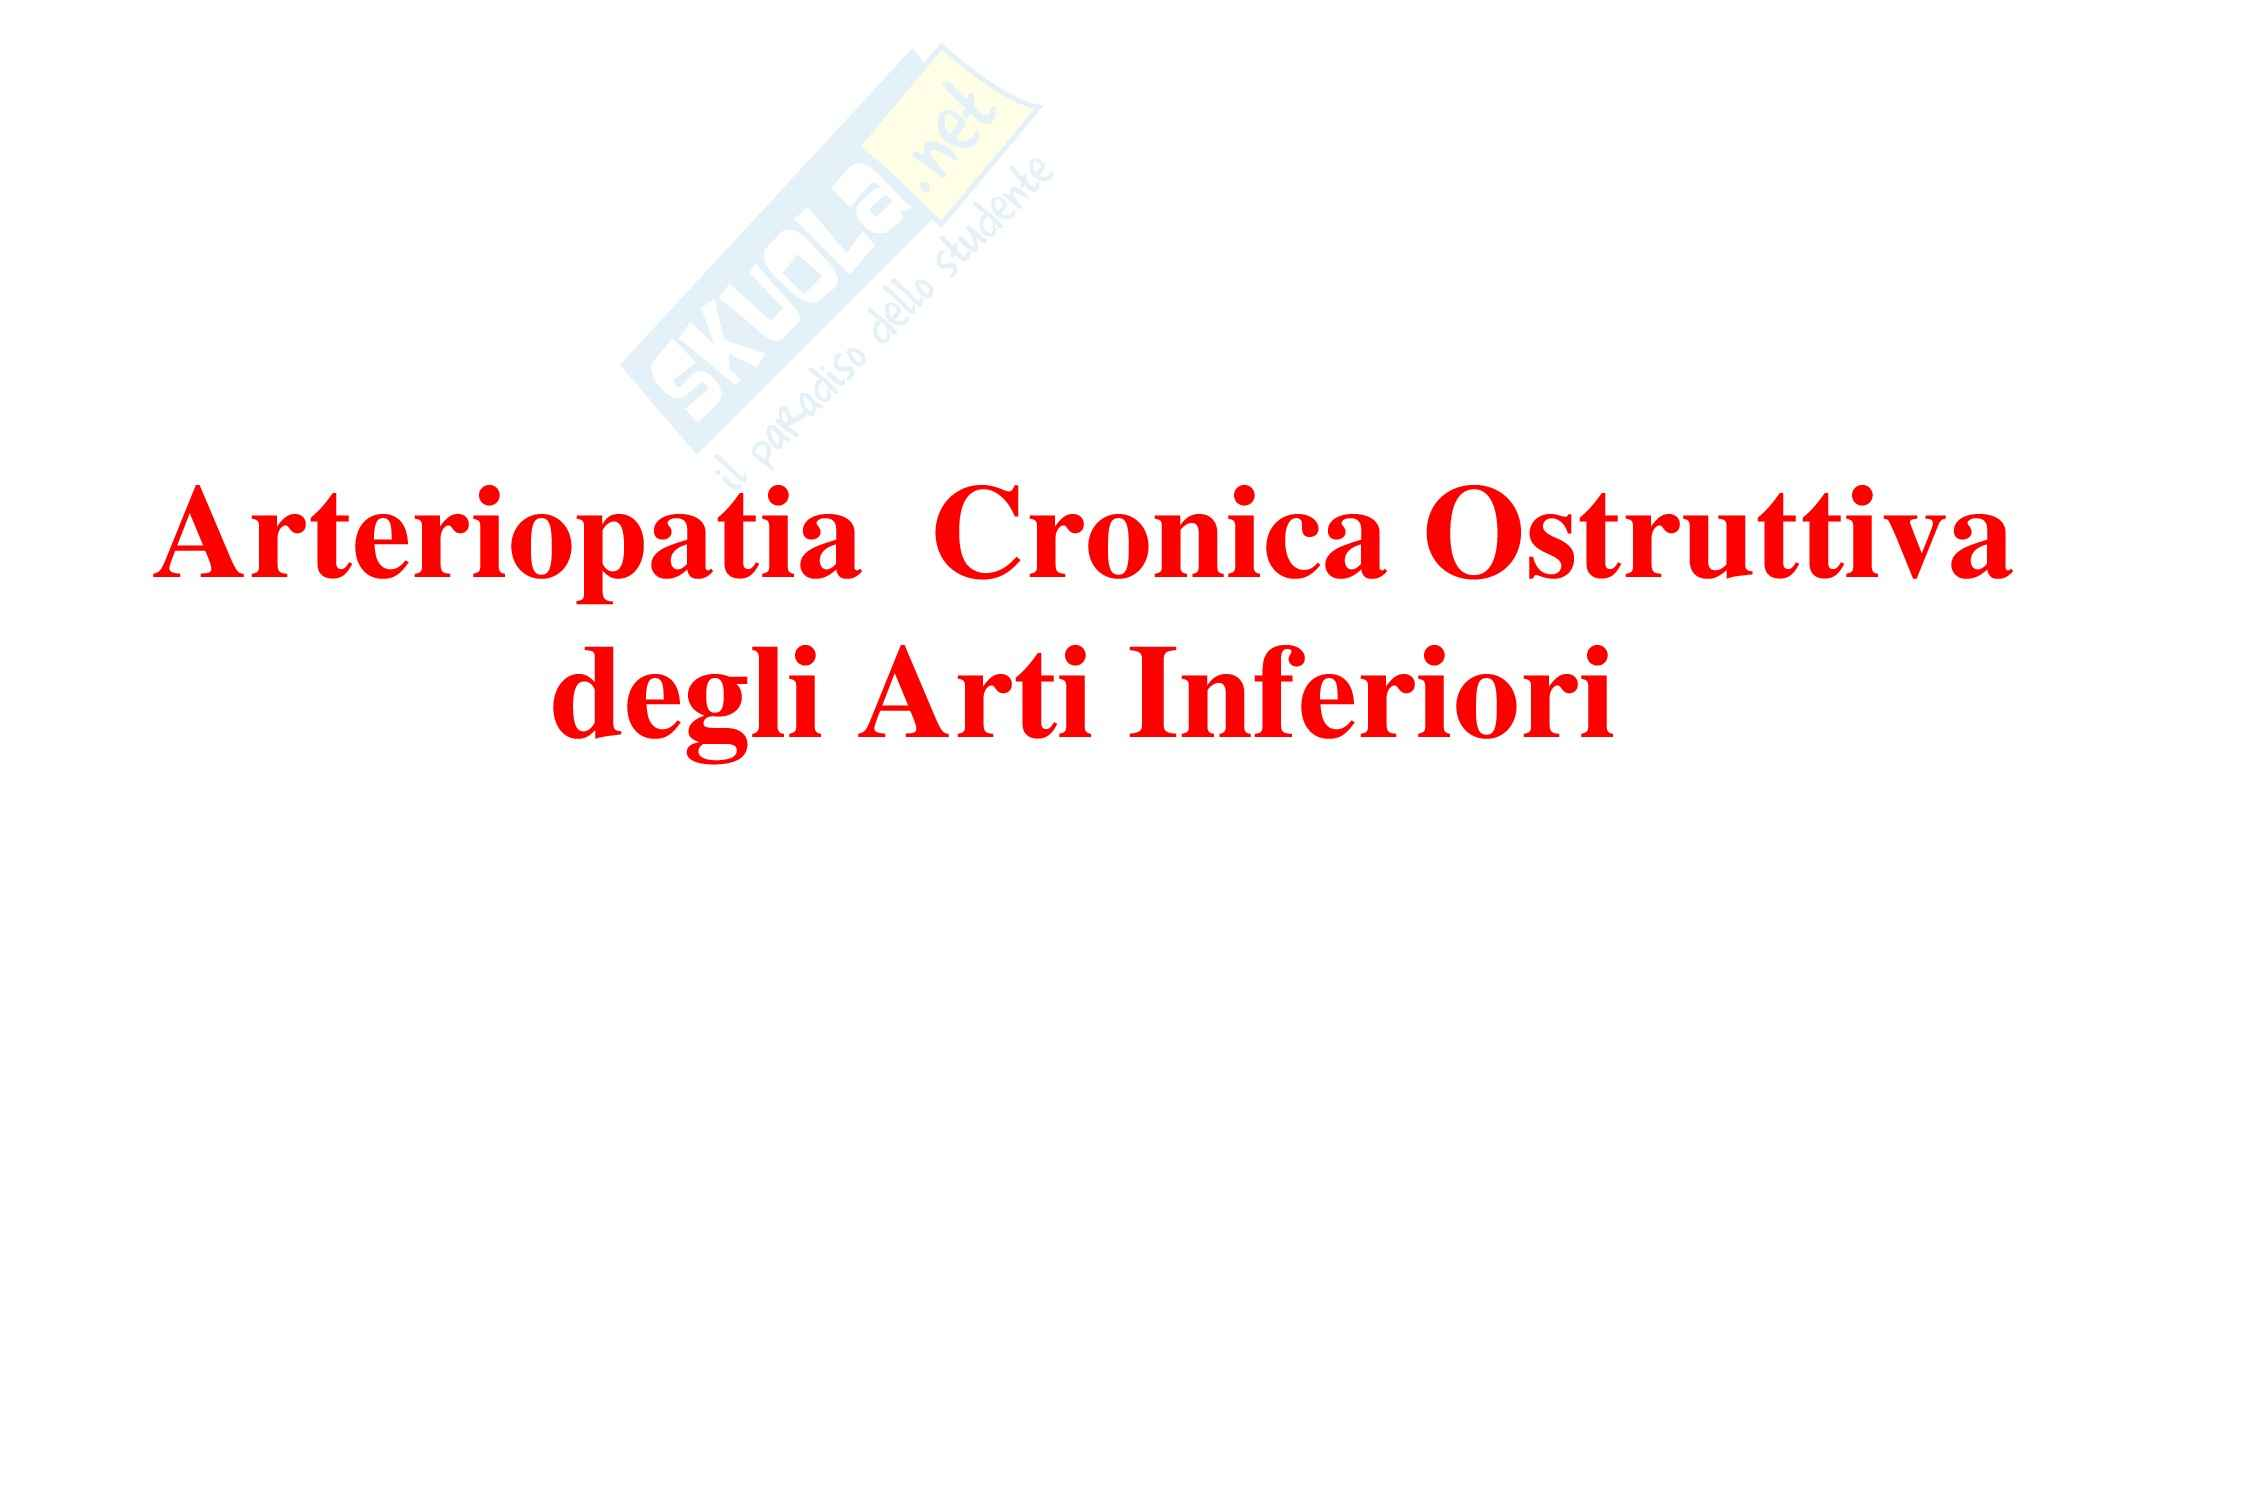 Cardiochirurgia - arteriopatia cronica ostruttiva arti inferiori